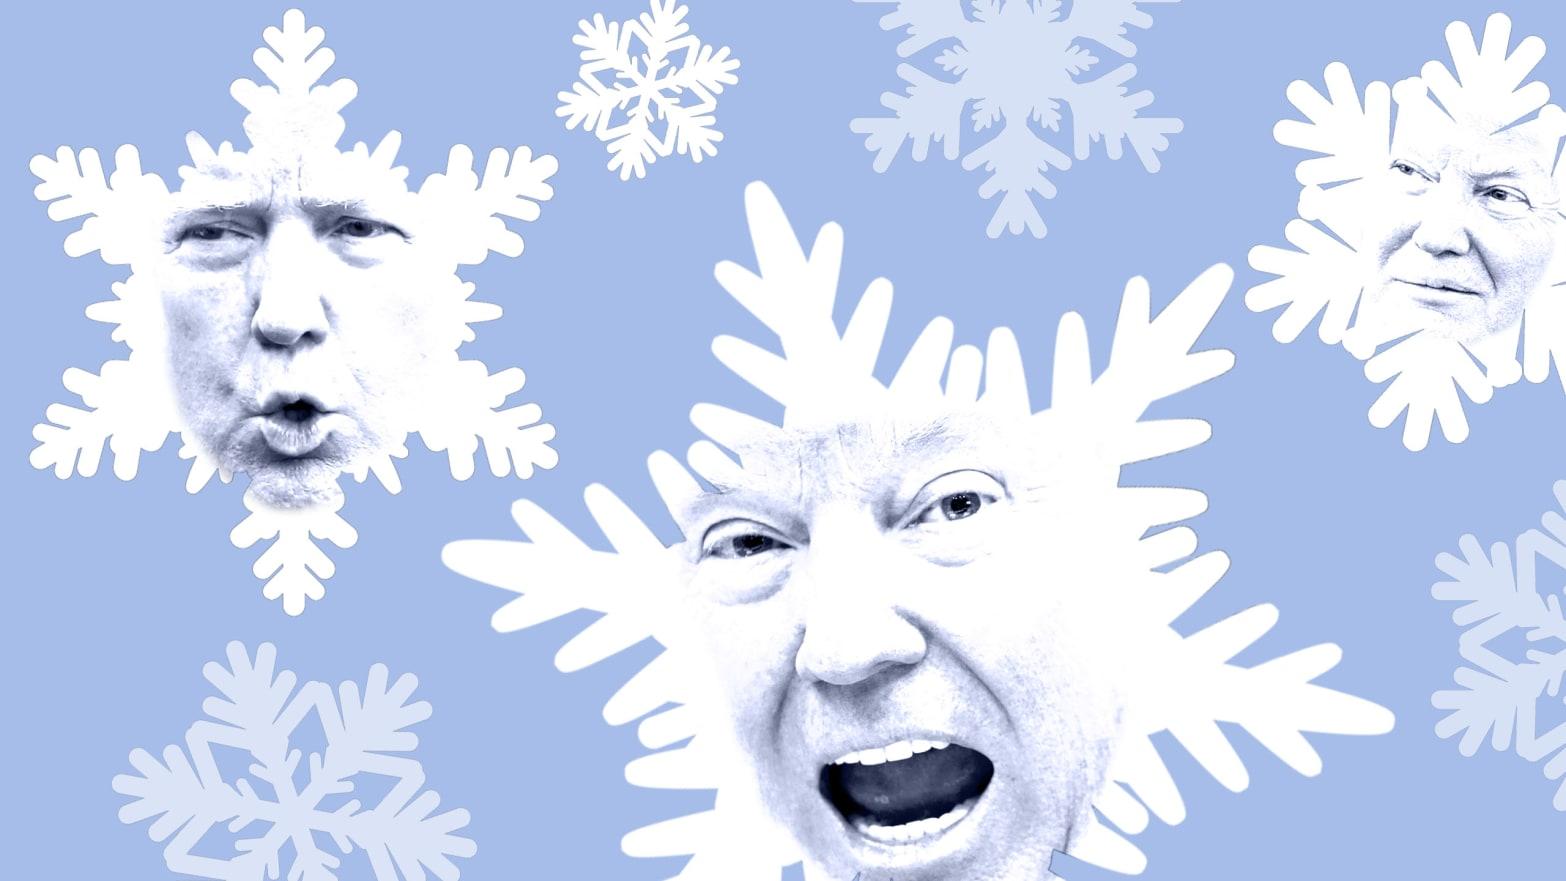 170705-ryan-president-snowflake-tease_or